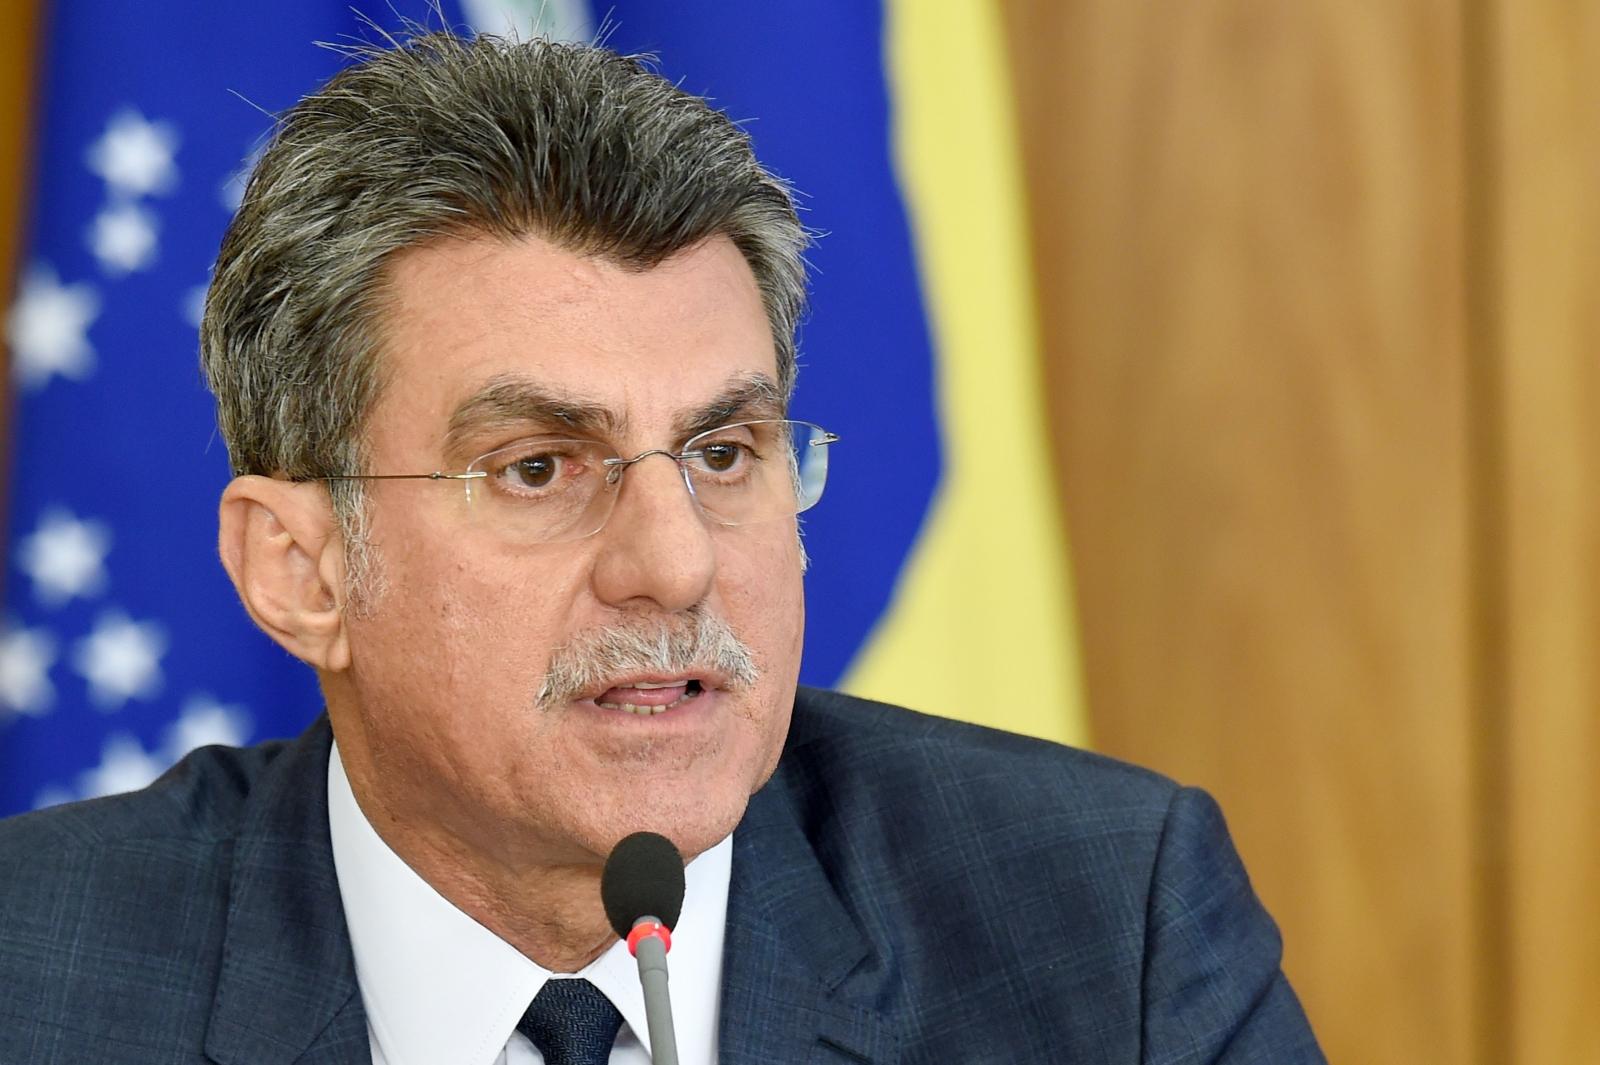 Brazil's Planning Minister Romero Juca